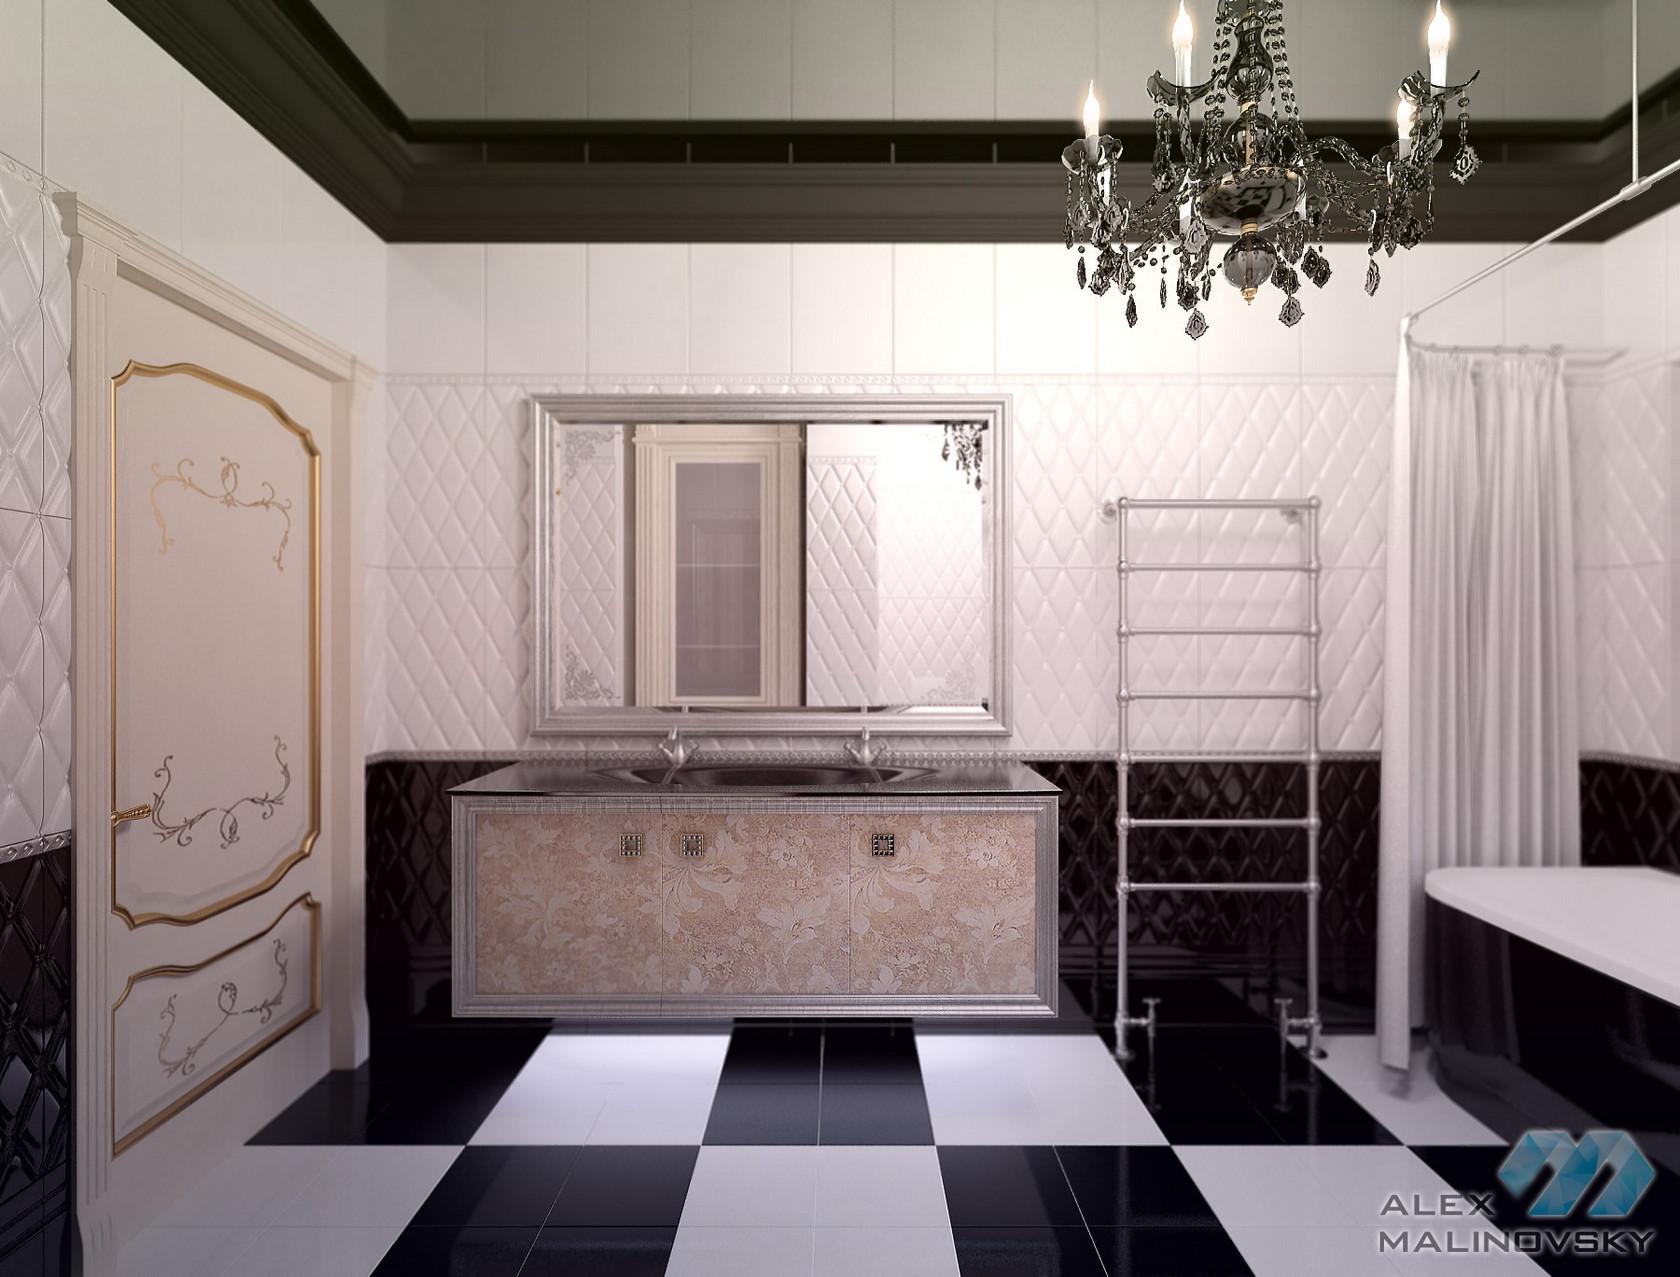 Санузел 1, 4х комнатная квартира, ЖК Парус, СПб